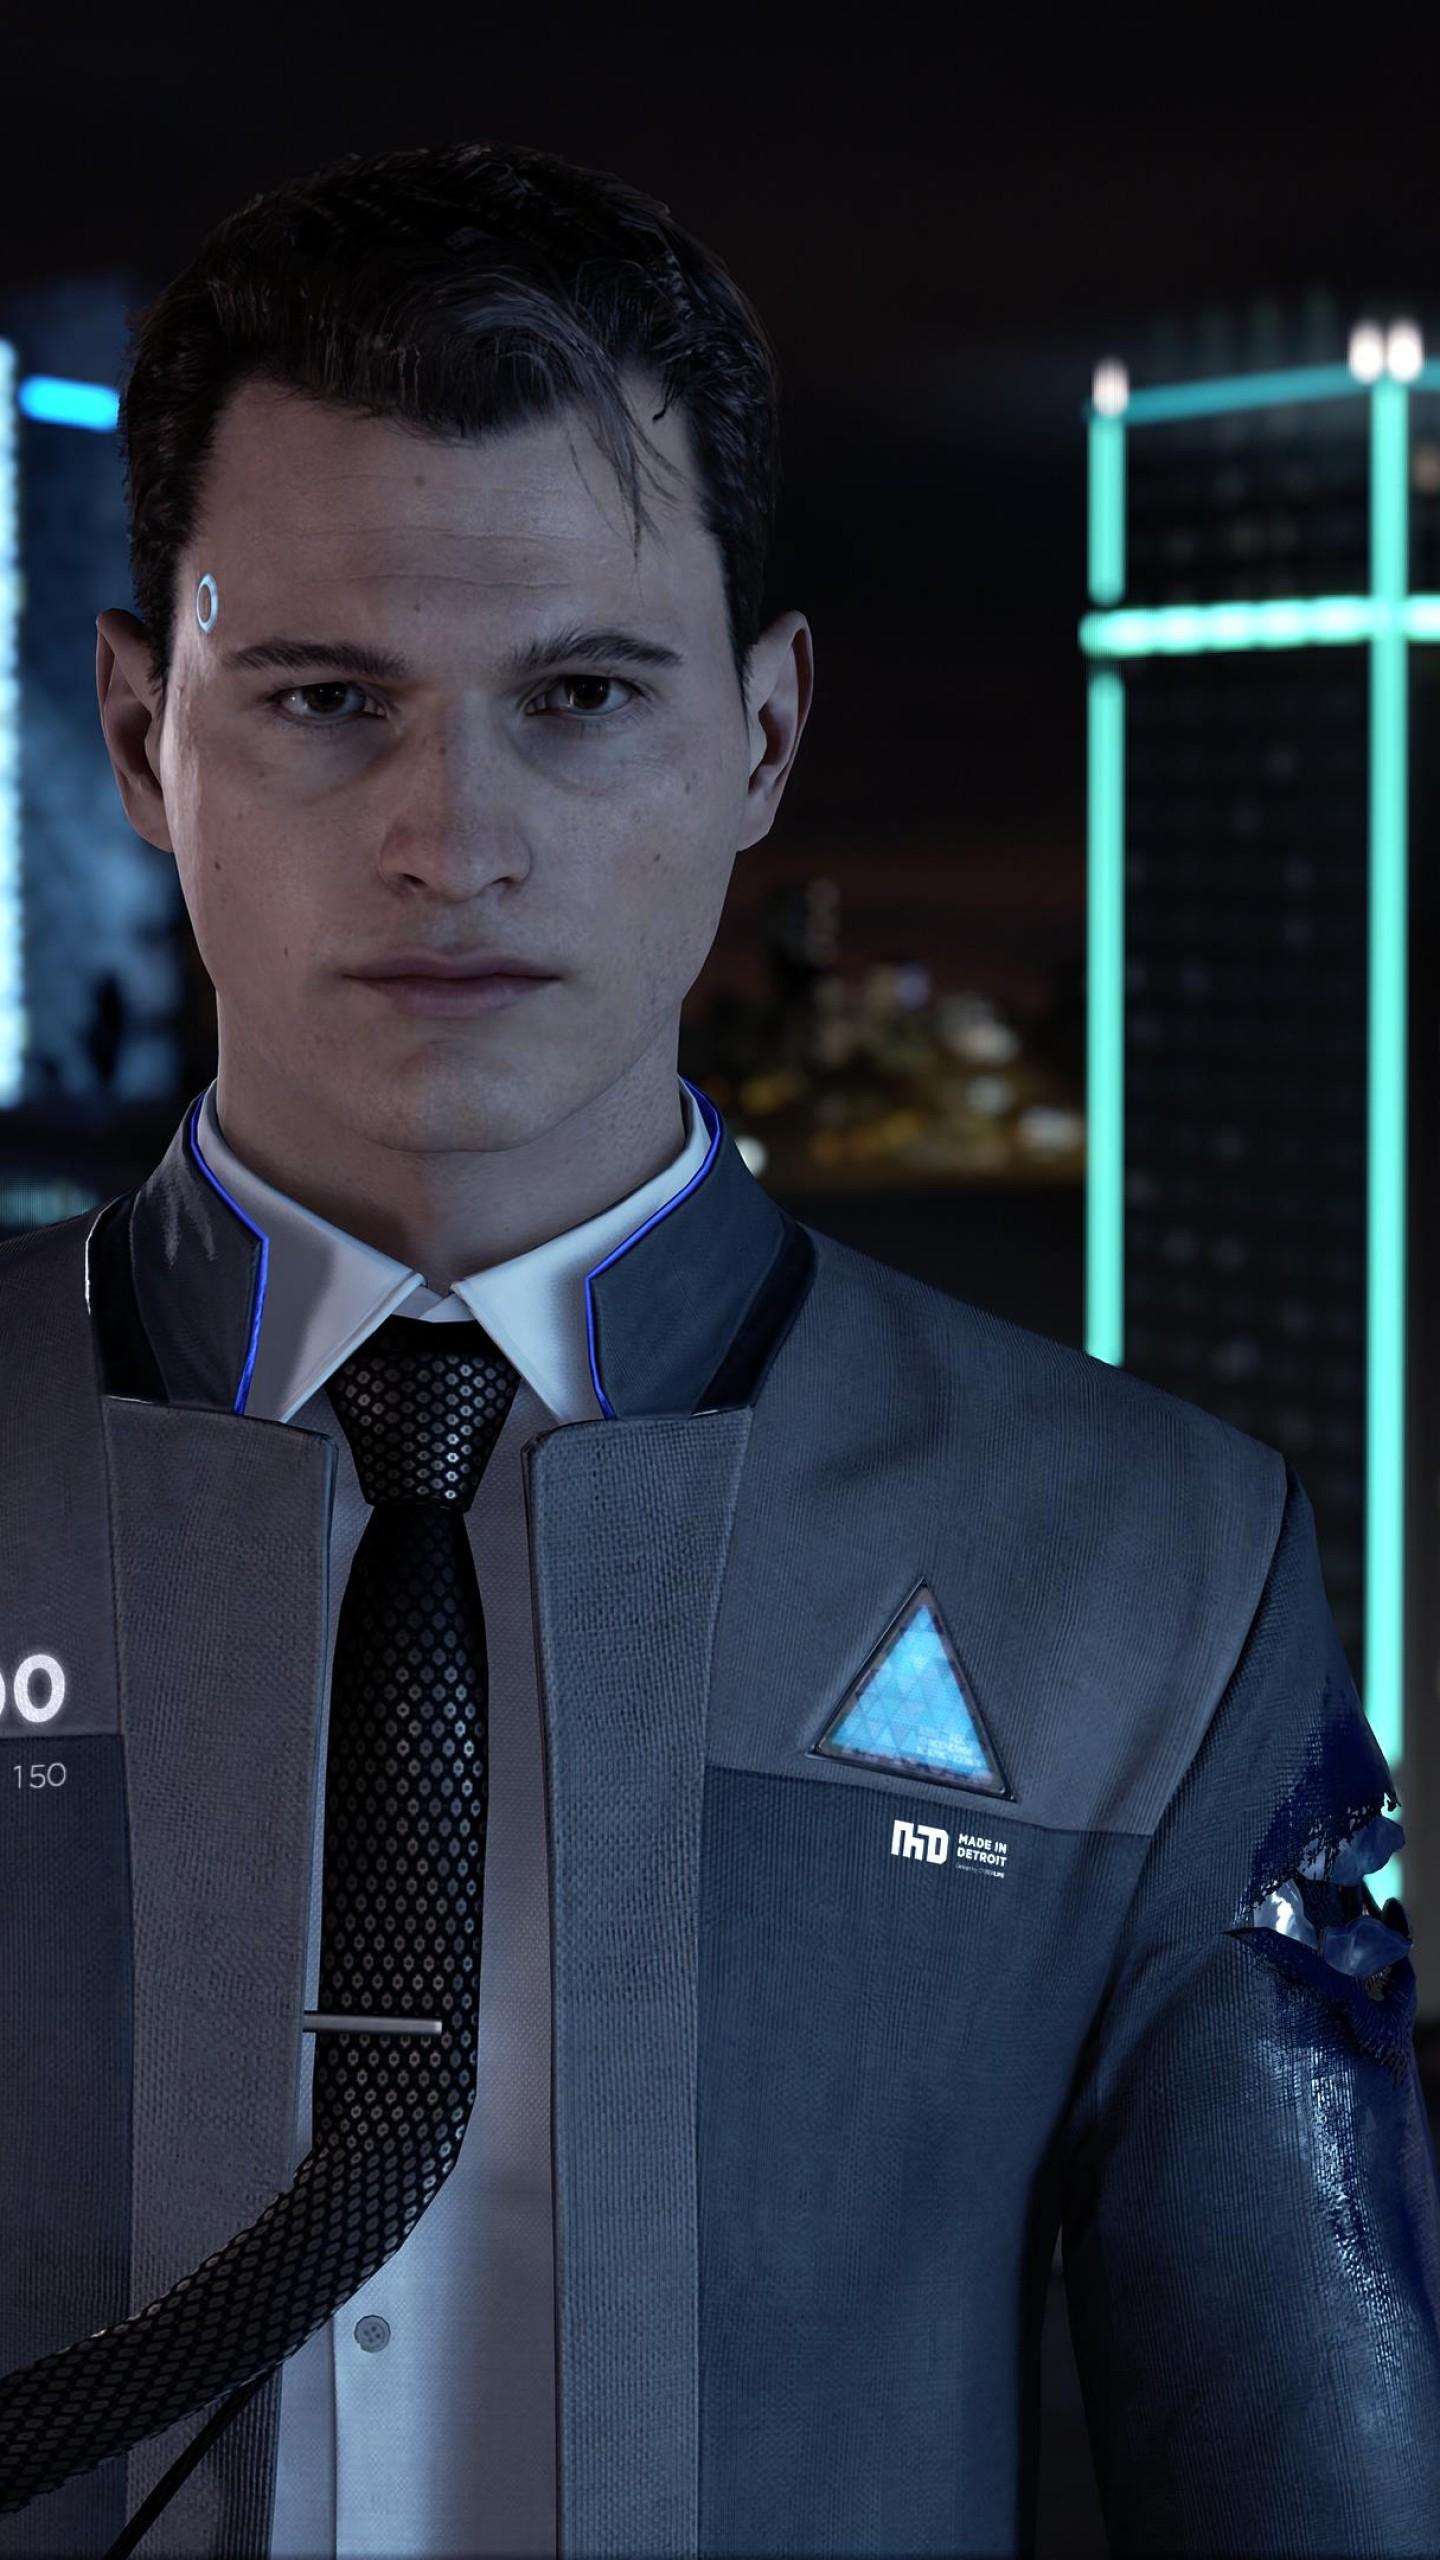 Wallpaper Detroit Become Human 4k E3 2017 Screenshot Games 14314